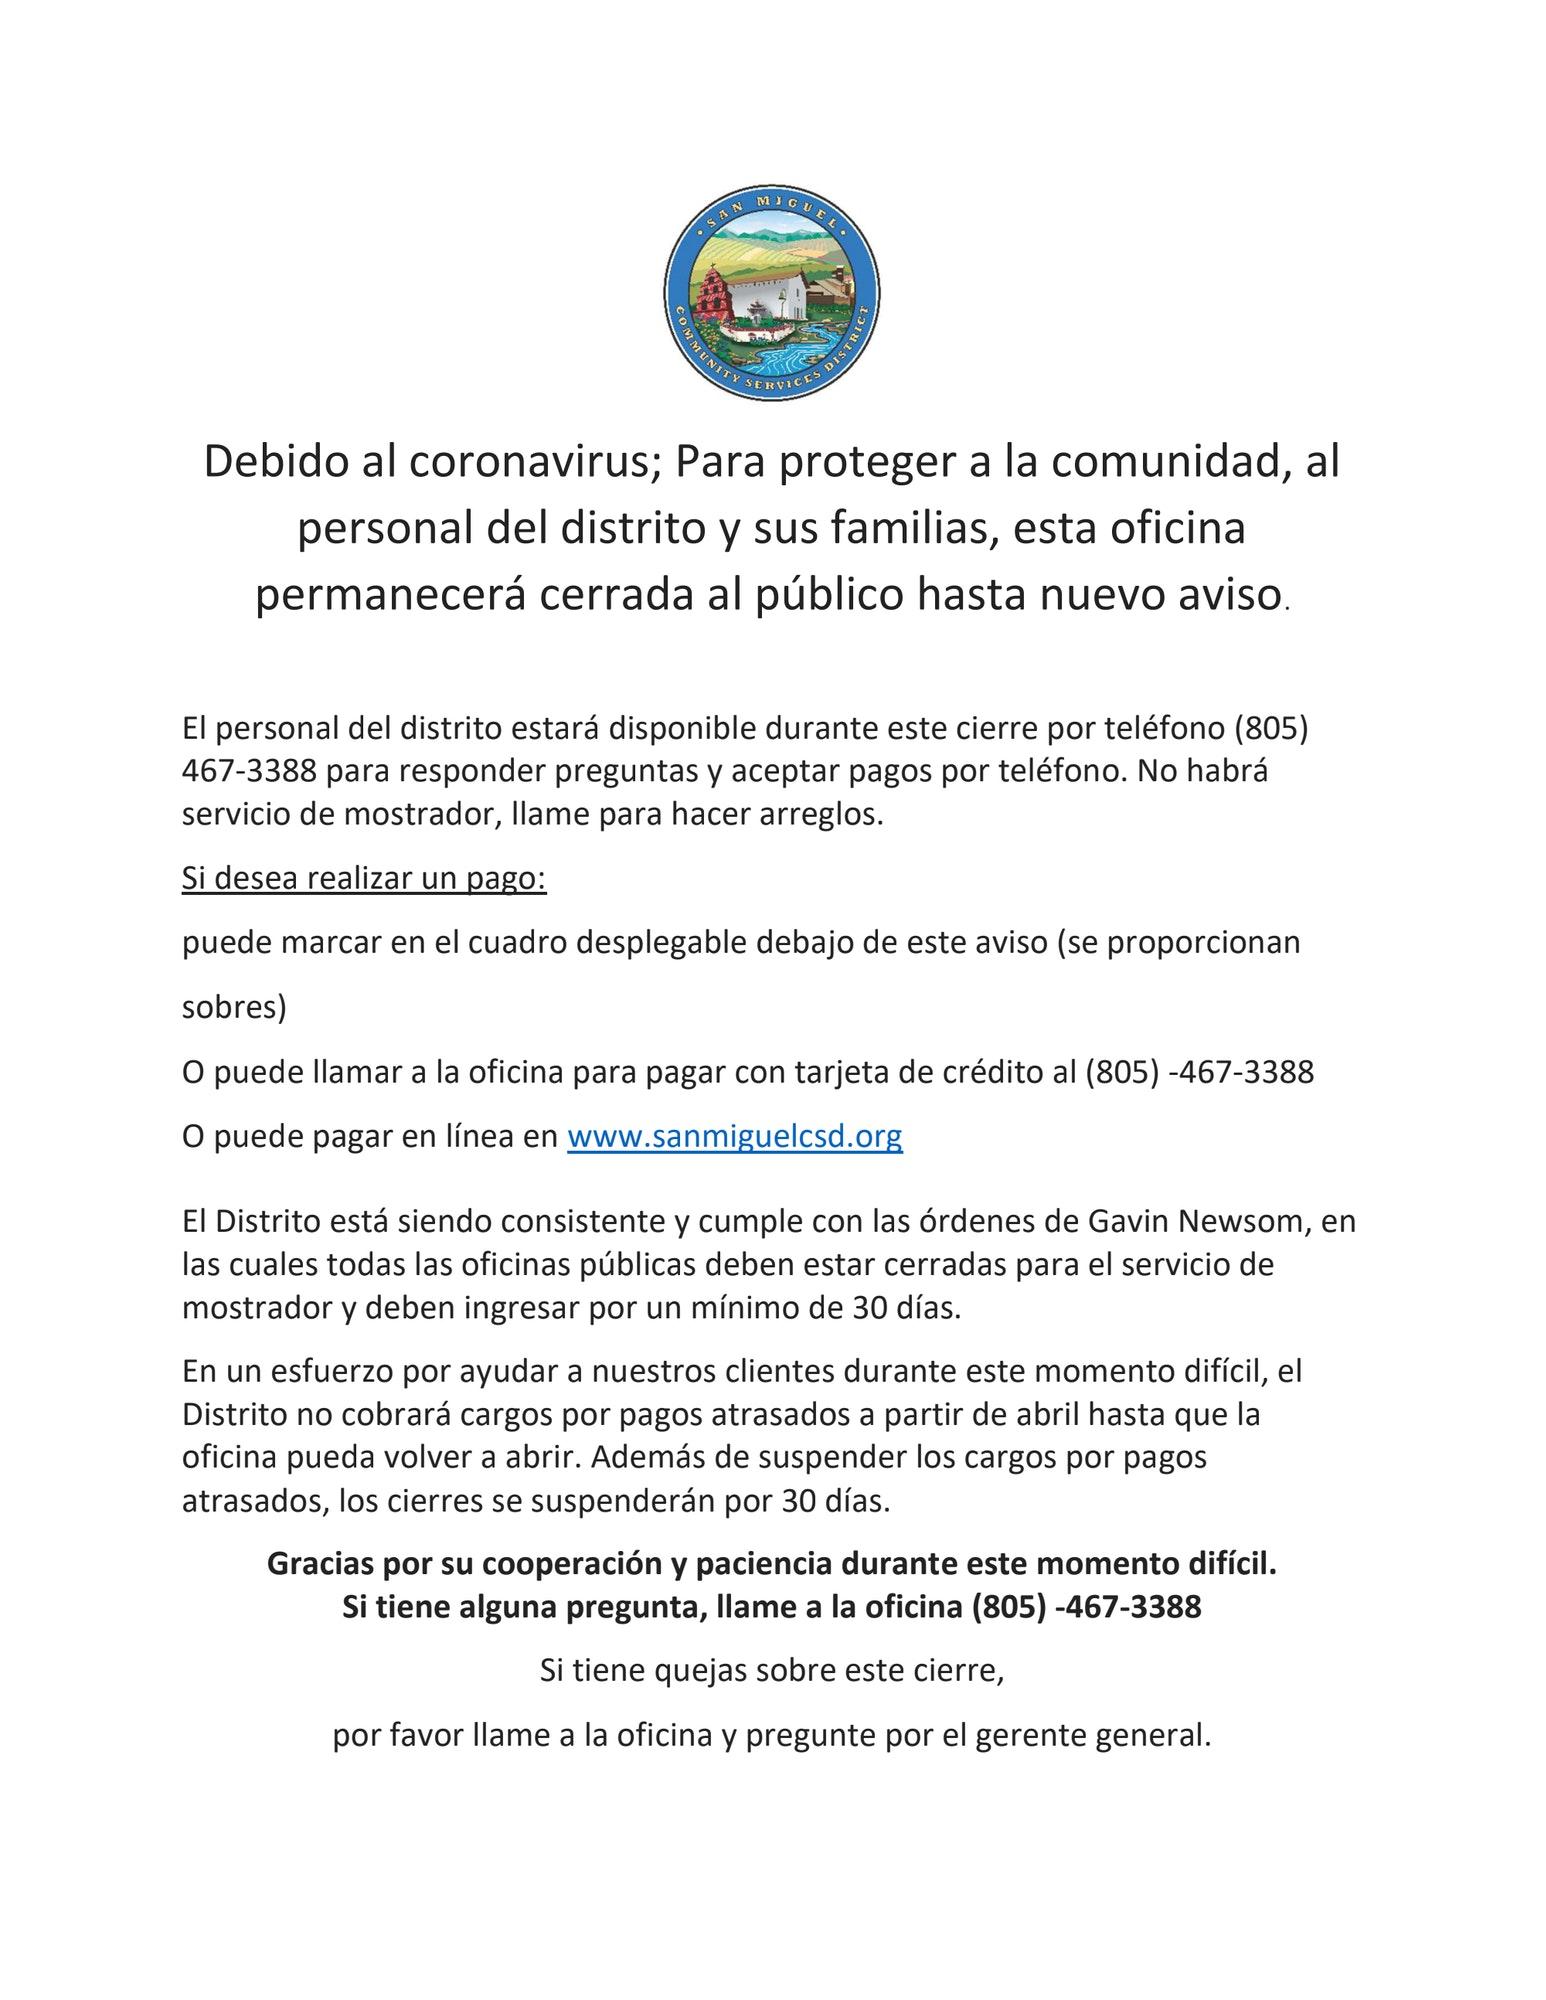 COVID-19 Spanish